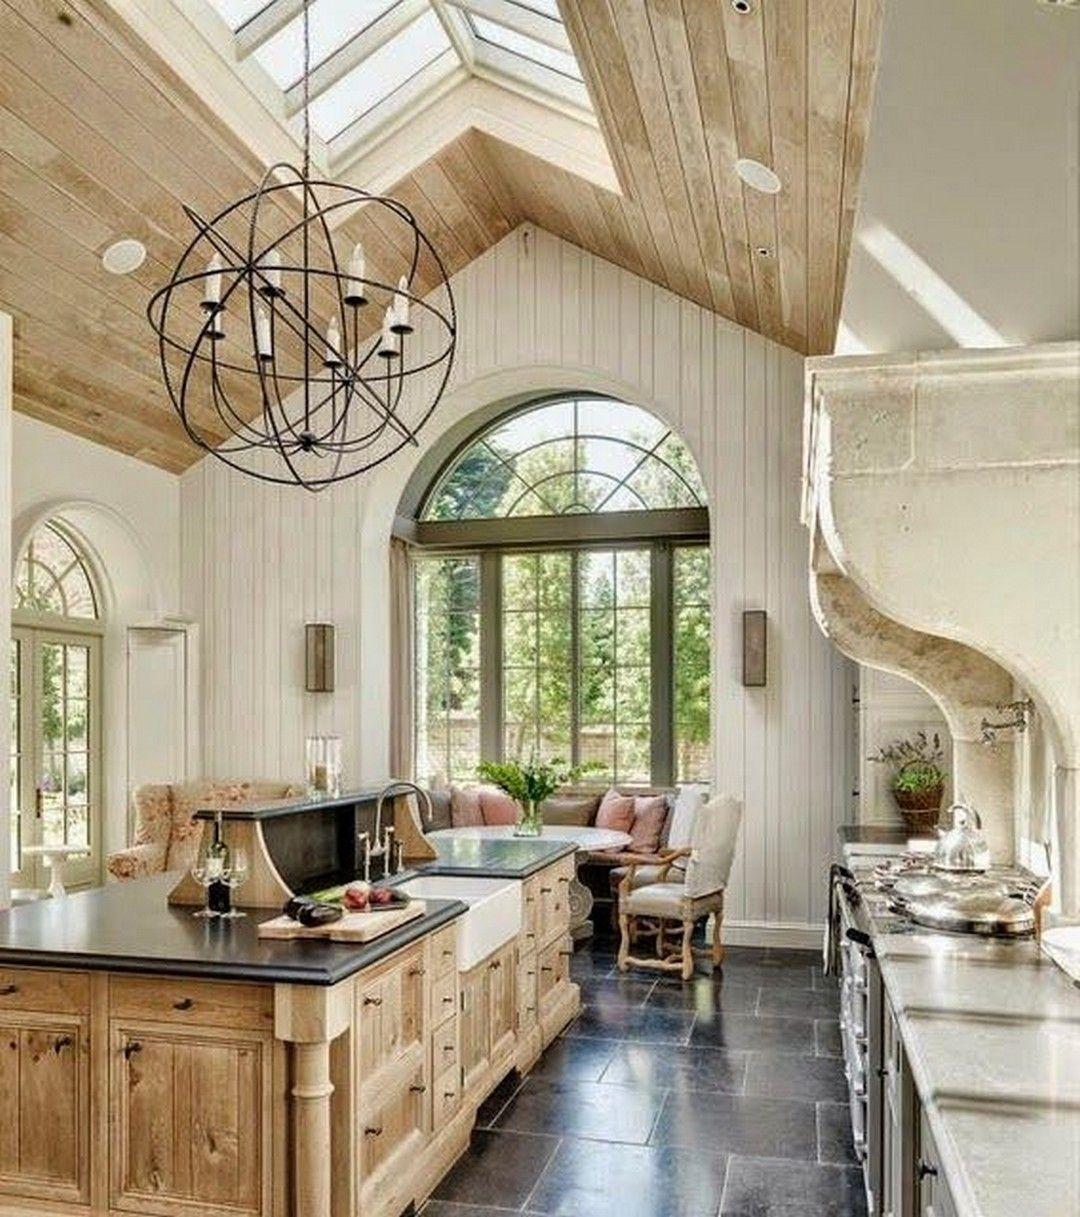 Period Kitchens Designs Renovation: 99 French Country Kitchen Modern Design Ideas